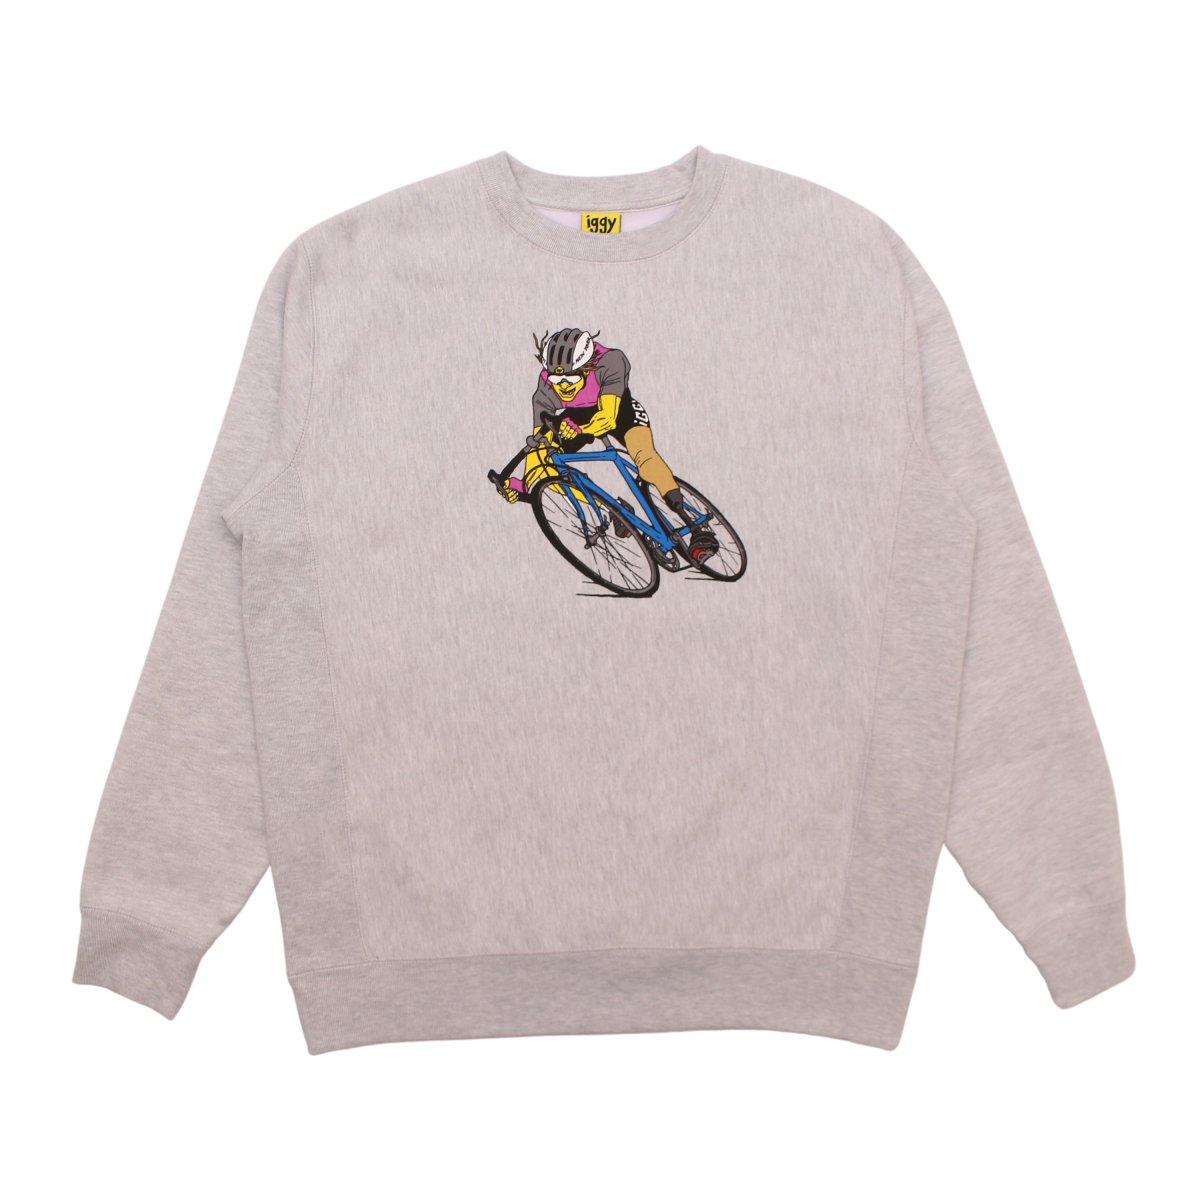 Cycling Crewneck Sweatshirt